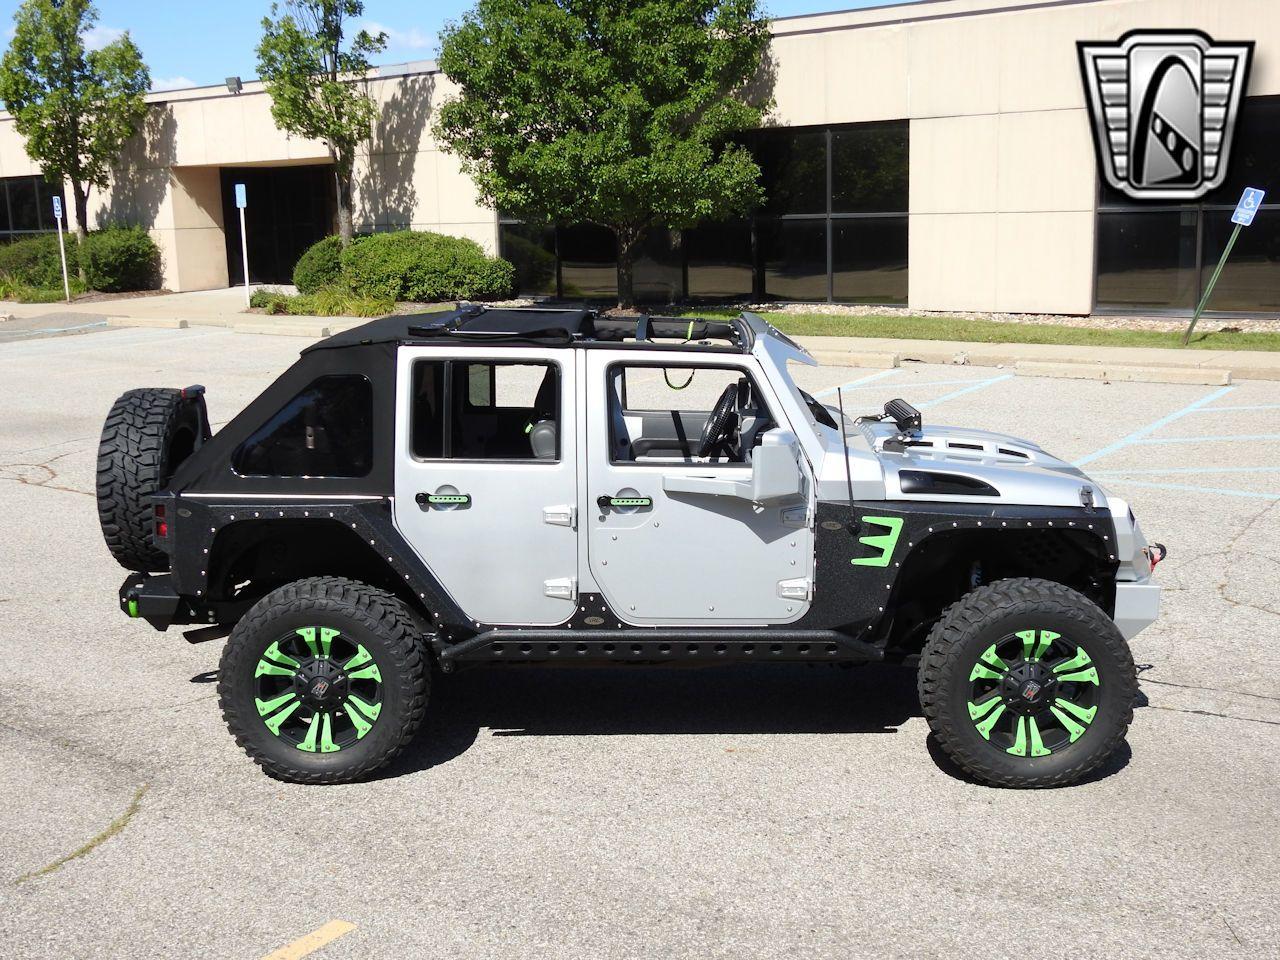 2010 Jeep Wrangler Unlimited Sahara For Sale